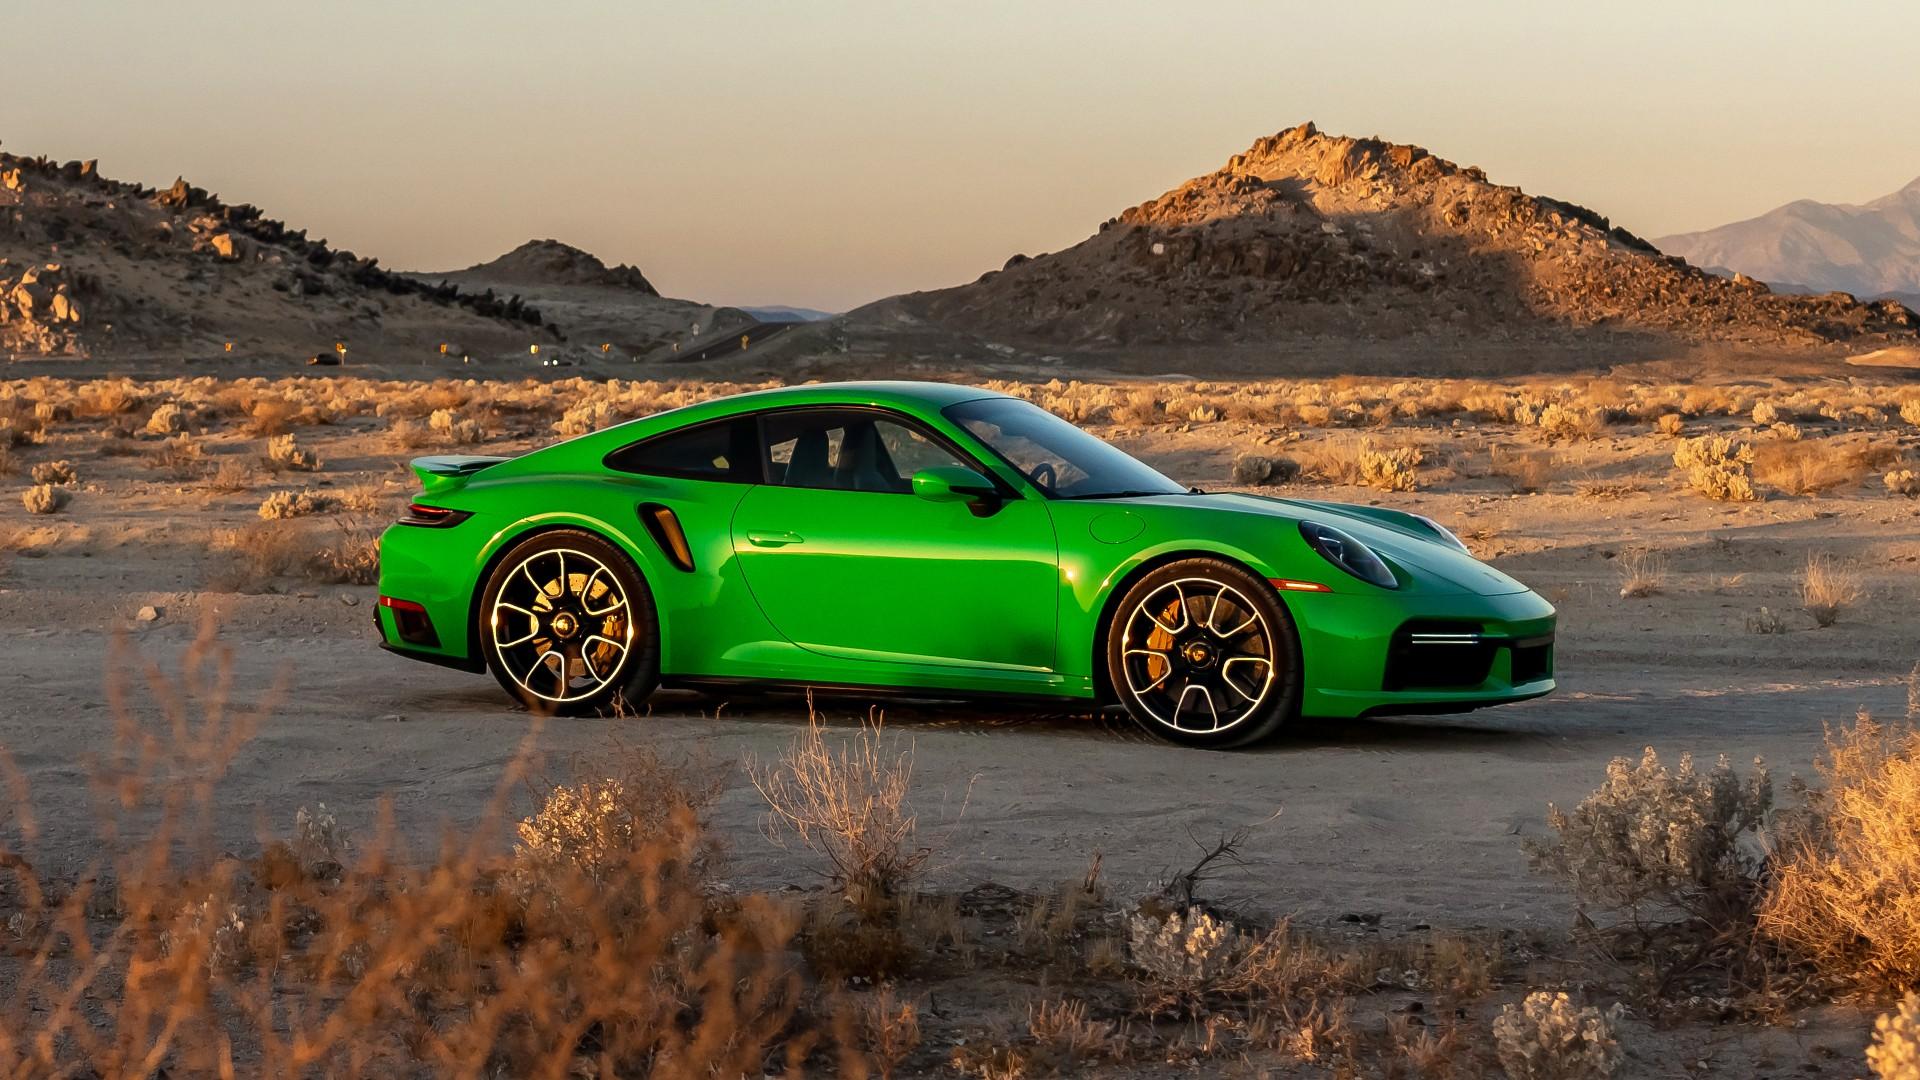 2021 Porsche 911 Turbo S 4K Wallpaper | HD Car Wallpapers ...